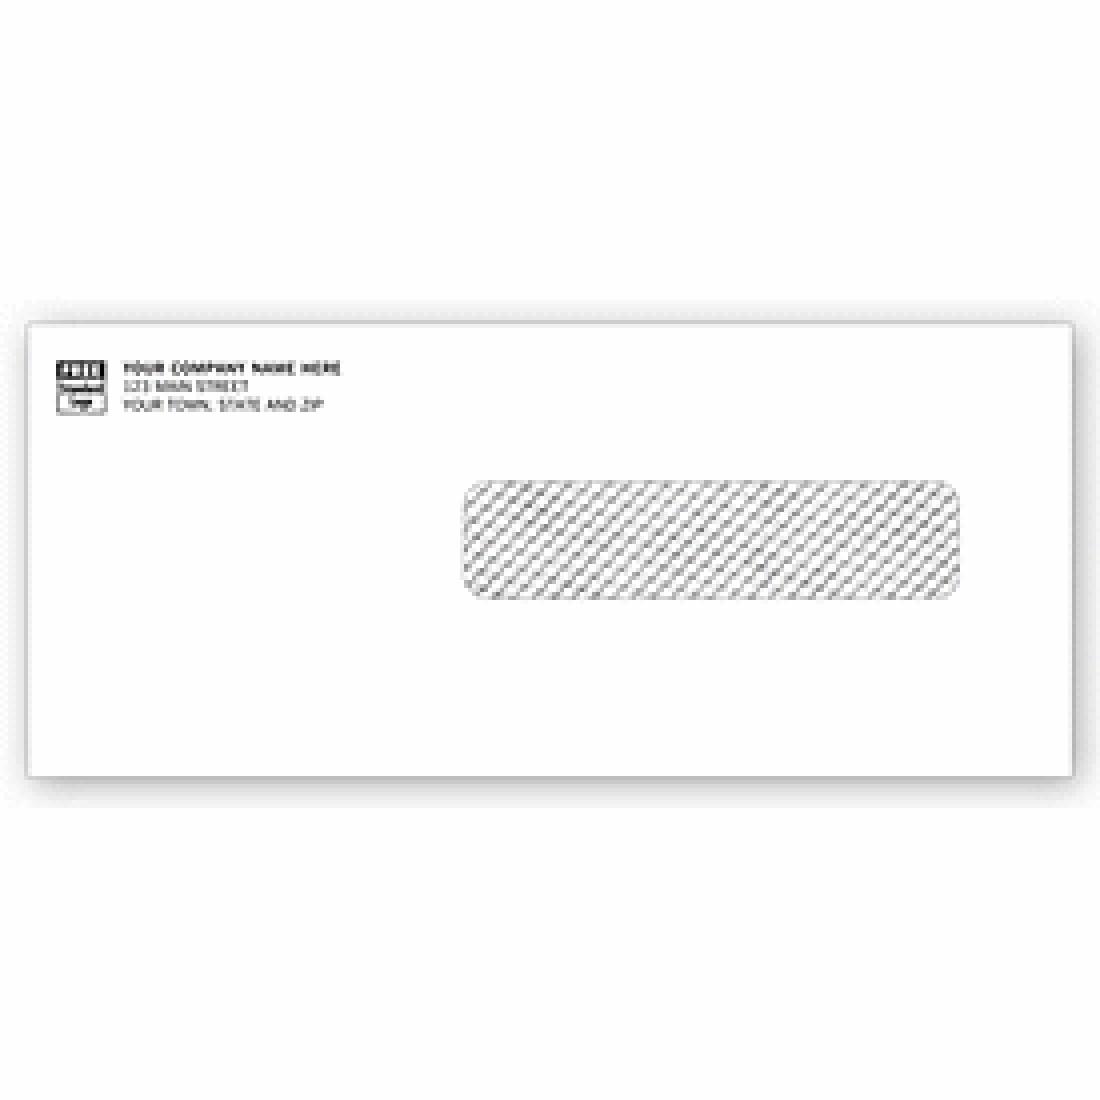 self sealing hcfa pre printed envelopes 2218x at print ez